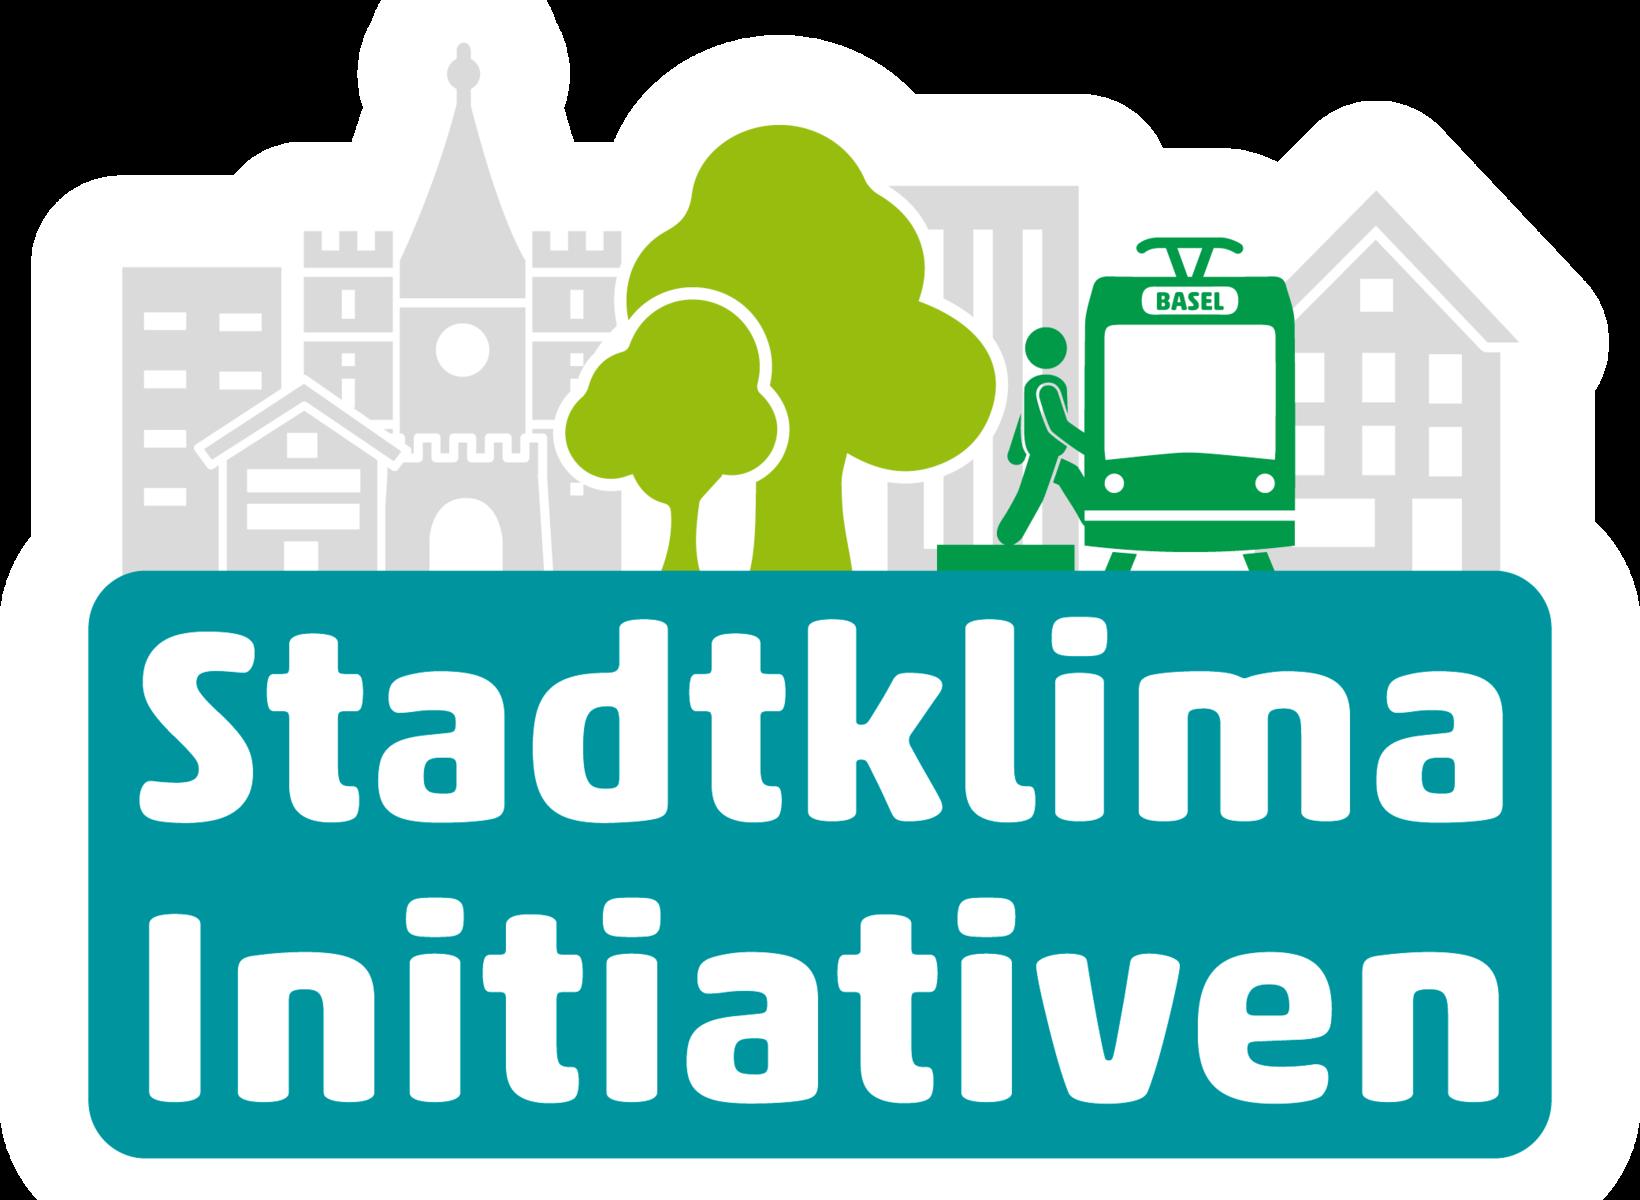 Die Stadtklima-Initiativen in Basel